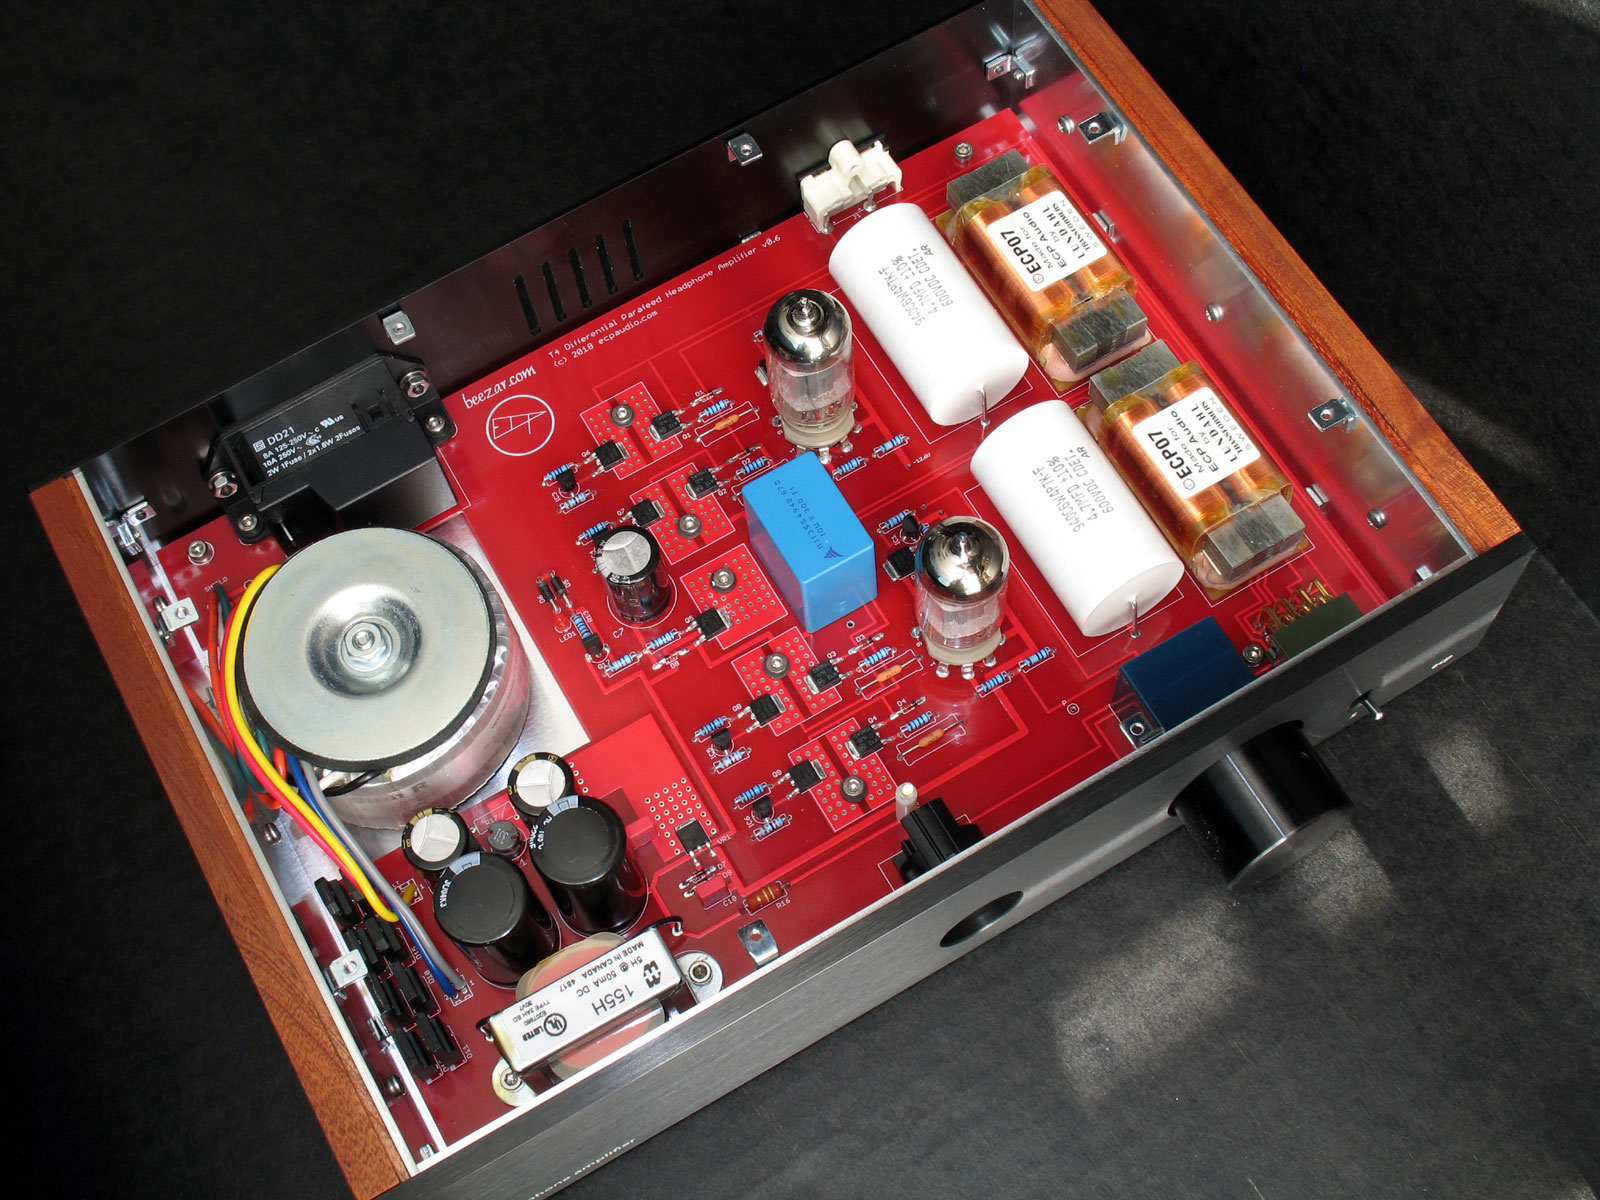 3DD9A0FC-B996-4042-BD5E-D684CCE5E3AC.jpeg